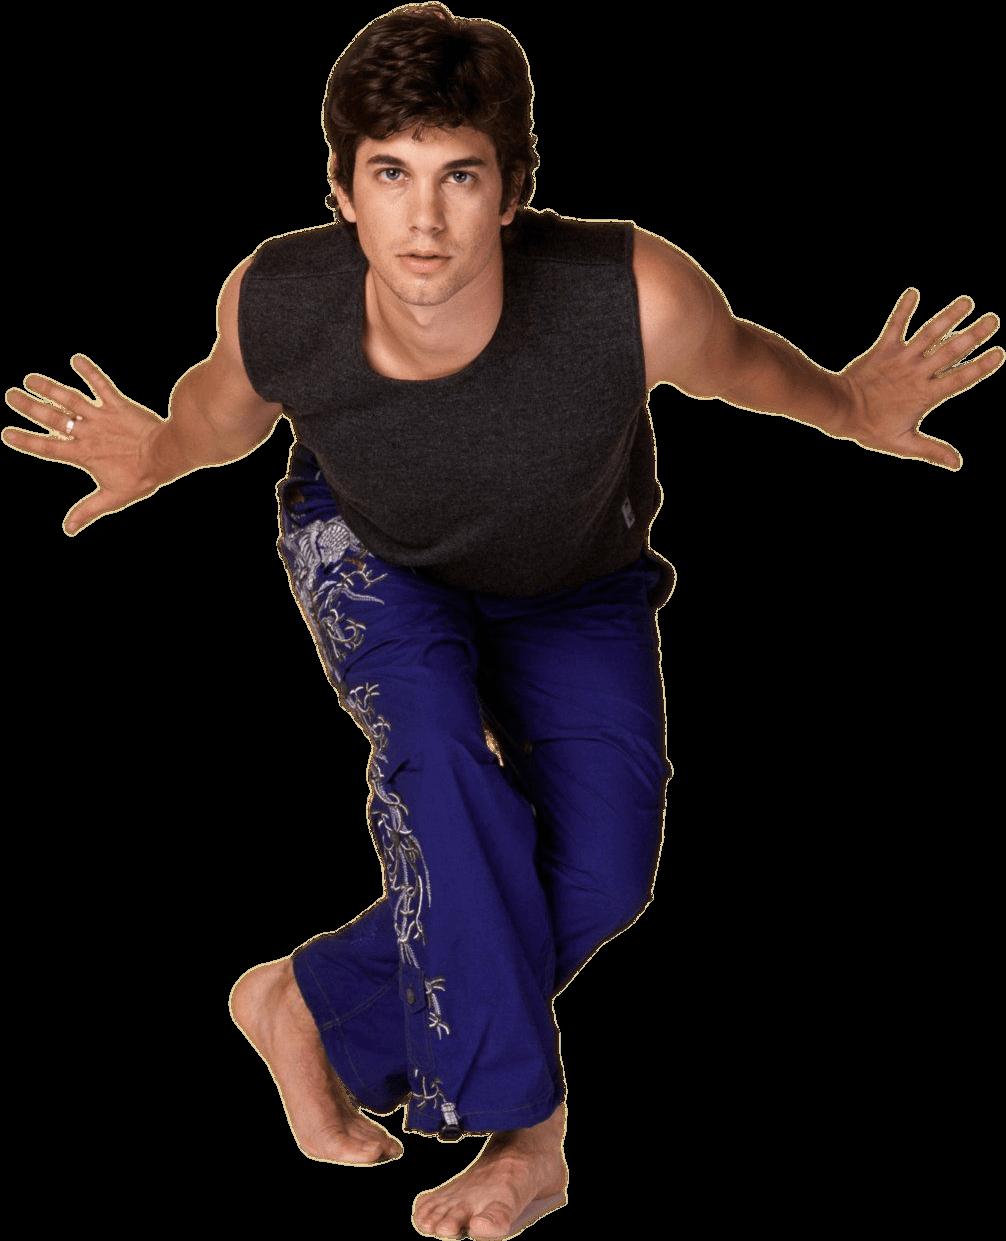 Zumba Dance Png Adam Garcia Dance Move Adam Garcia Barefoot 3326622 Vippng